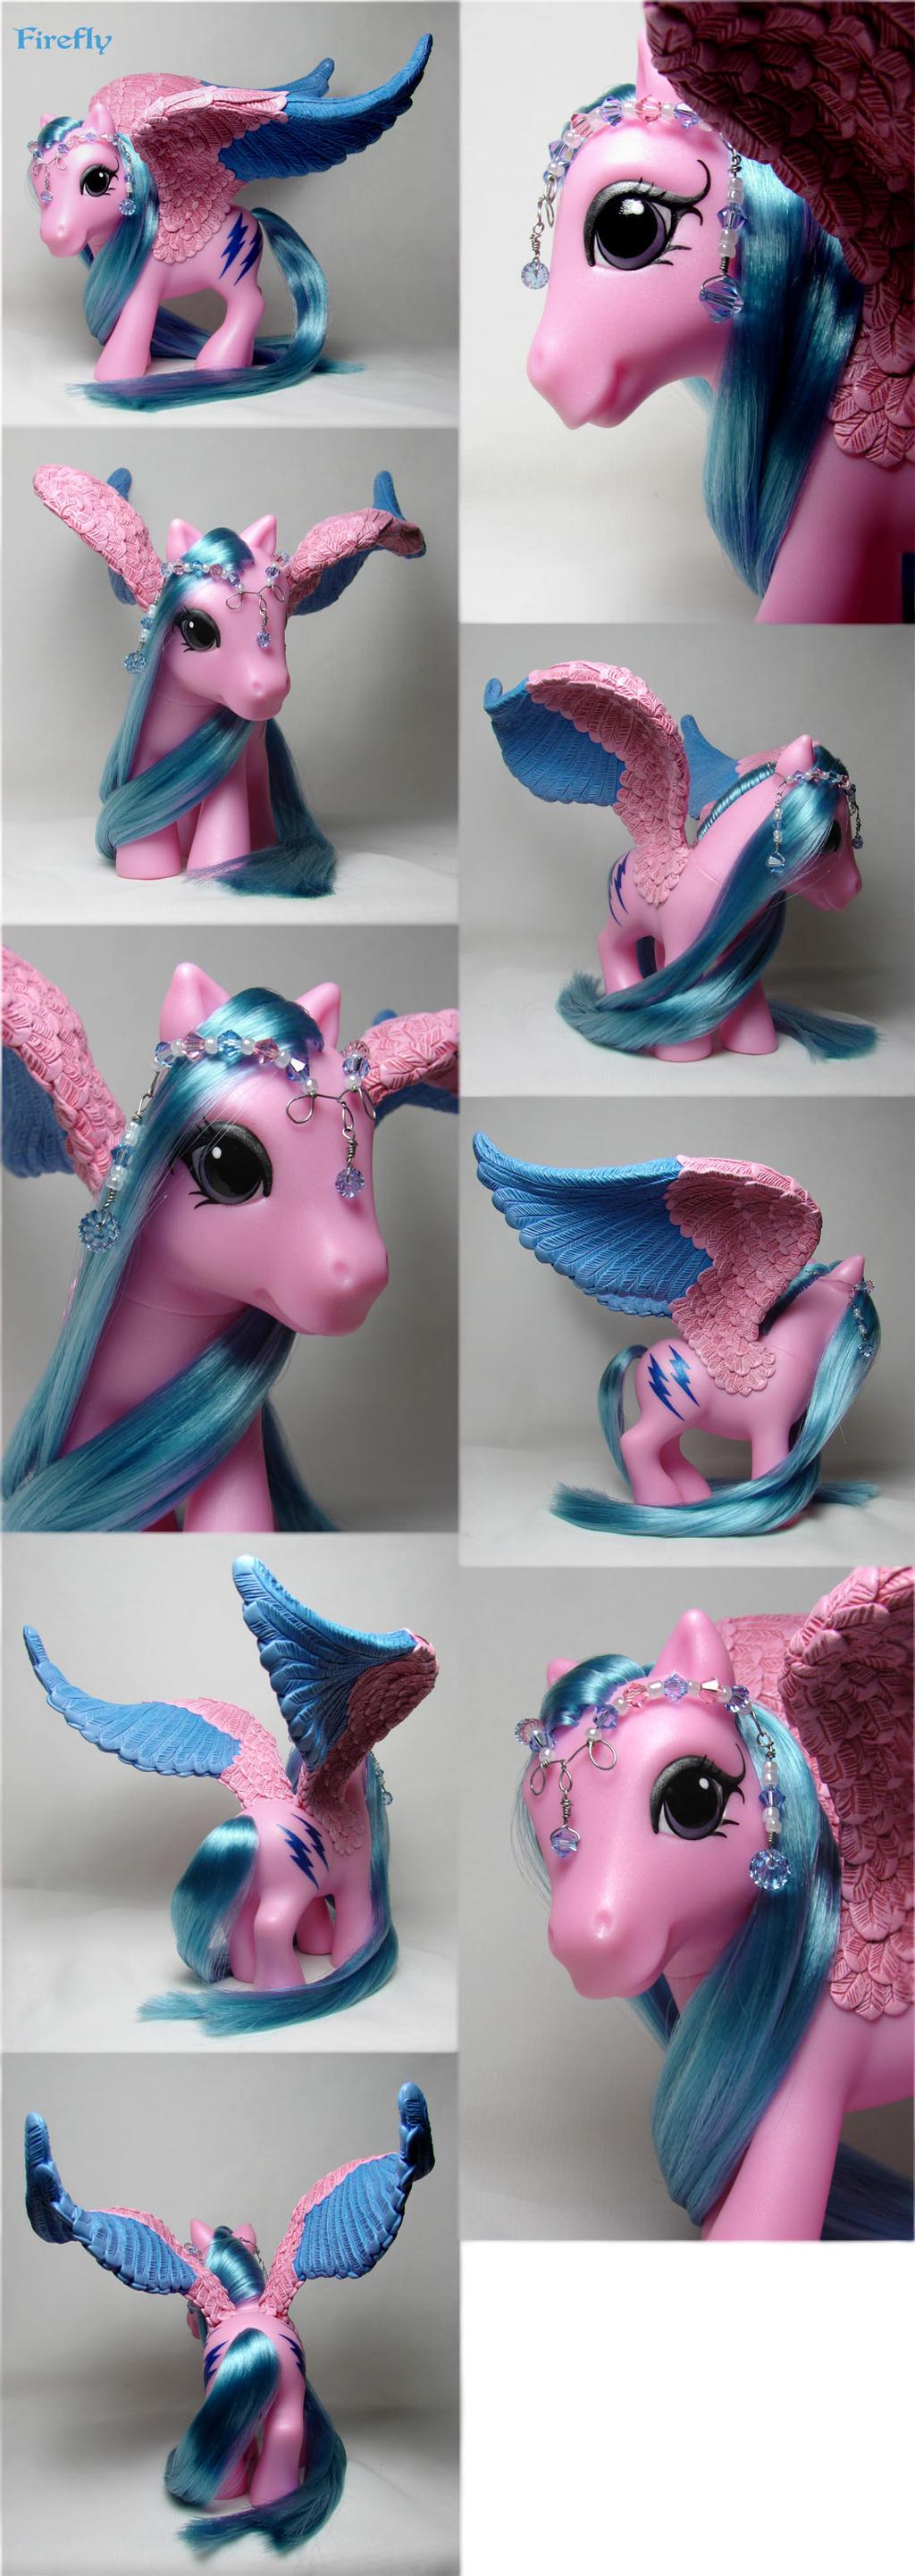 Firefly G3 pegasus pony by Woosie